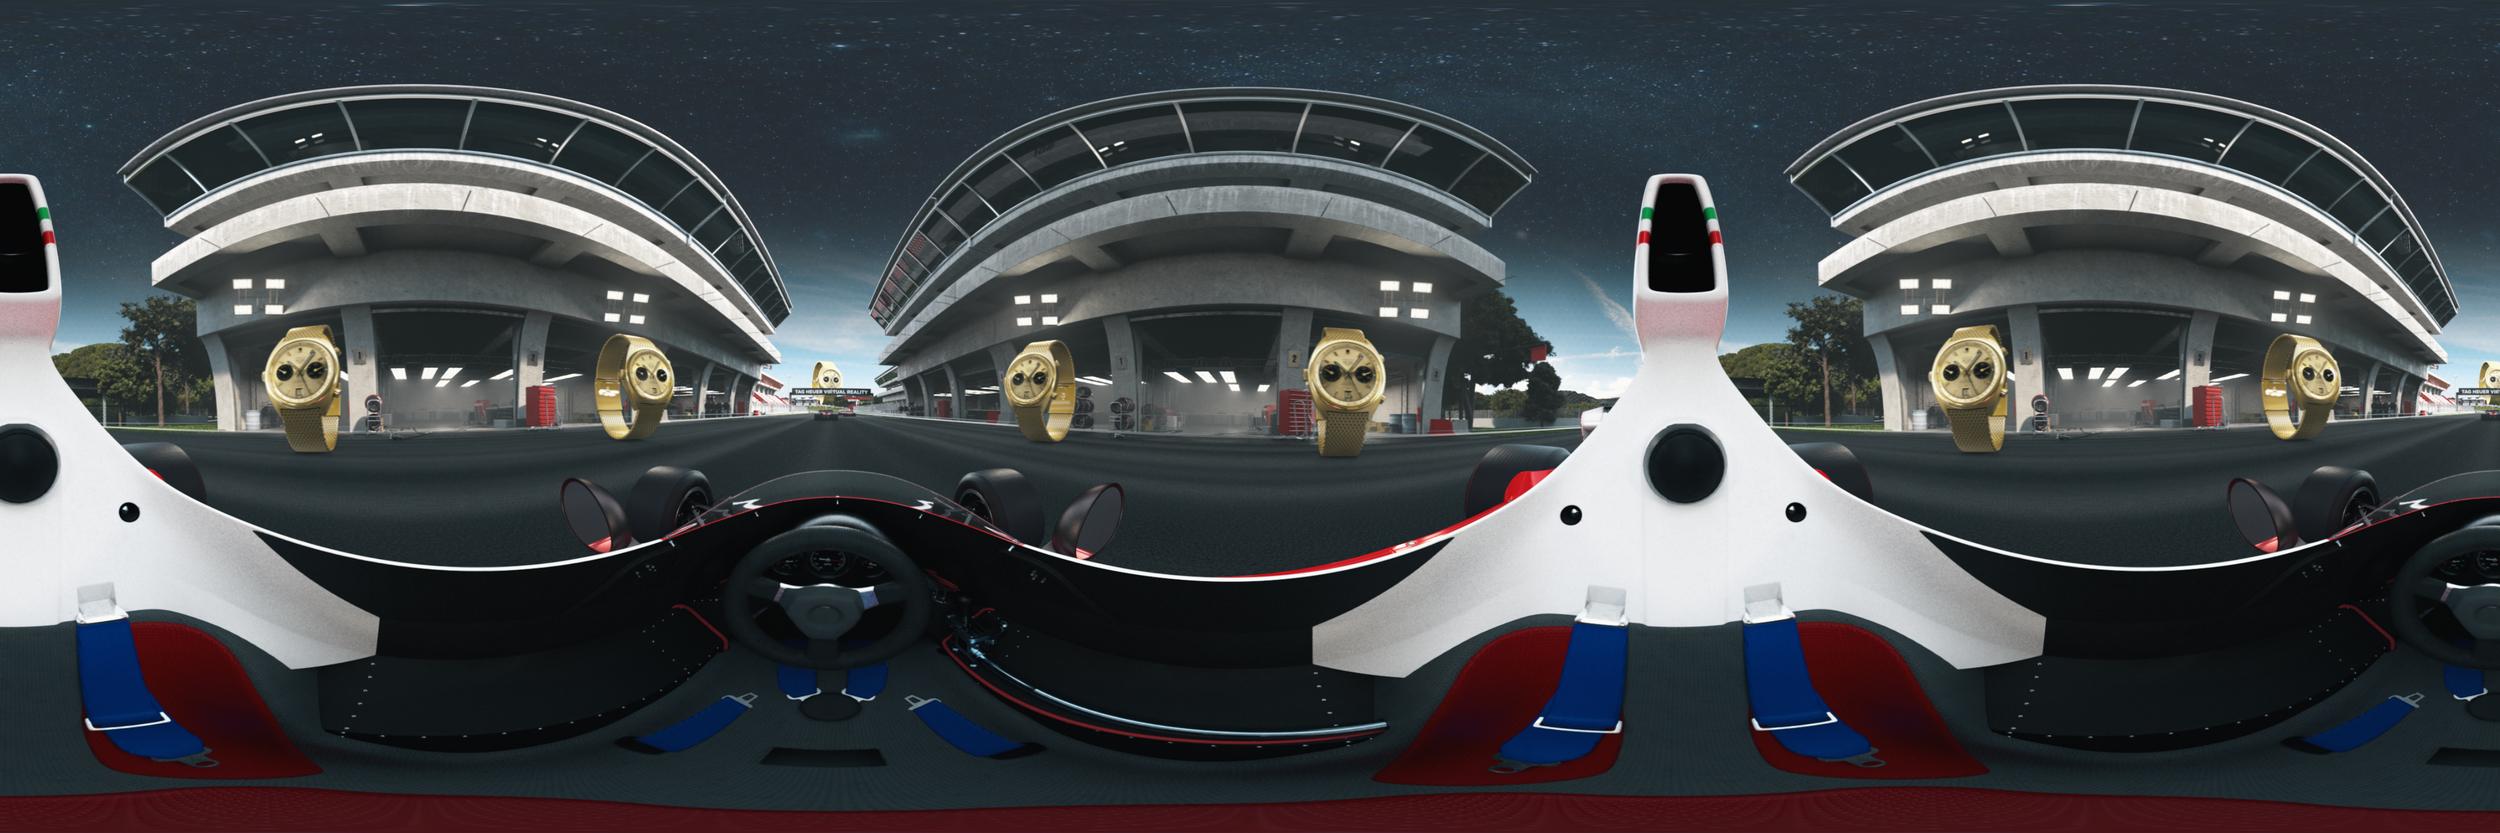 TH_VR-Panorama (02823).jpg